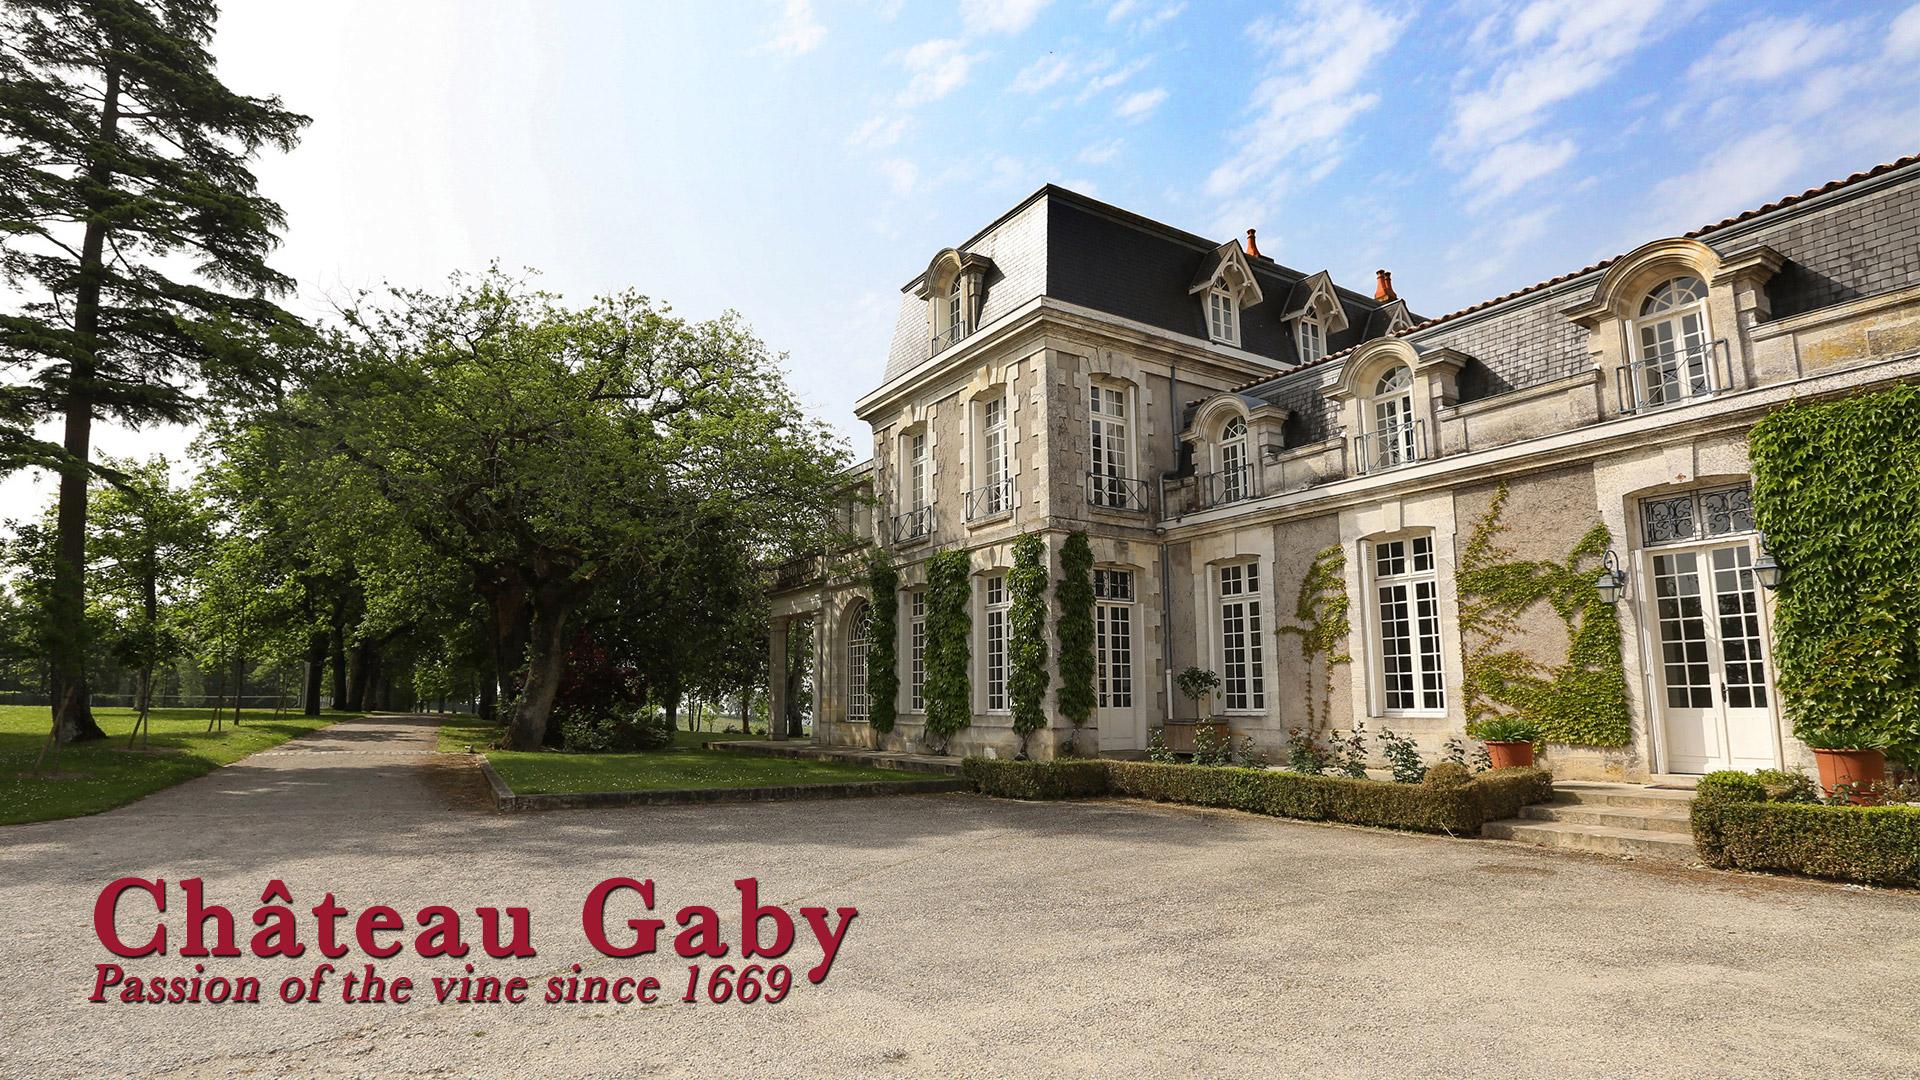 ChateauGaby-slider.jpg